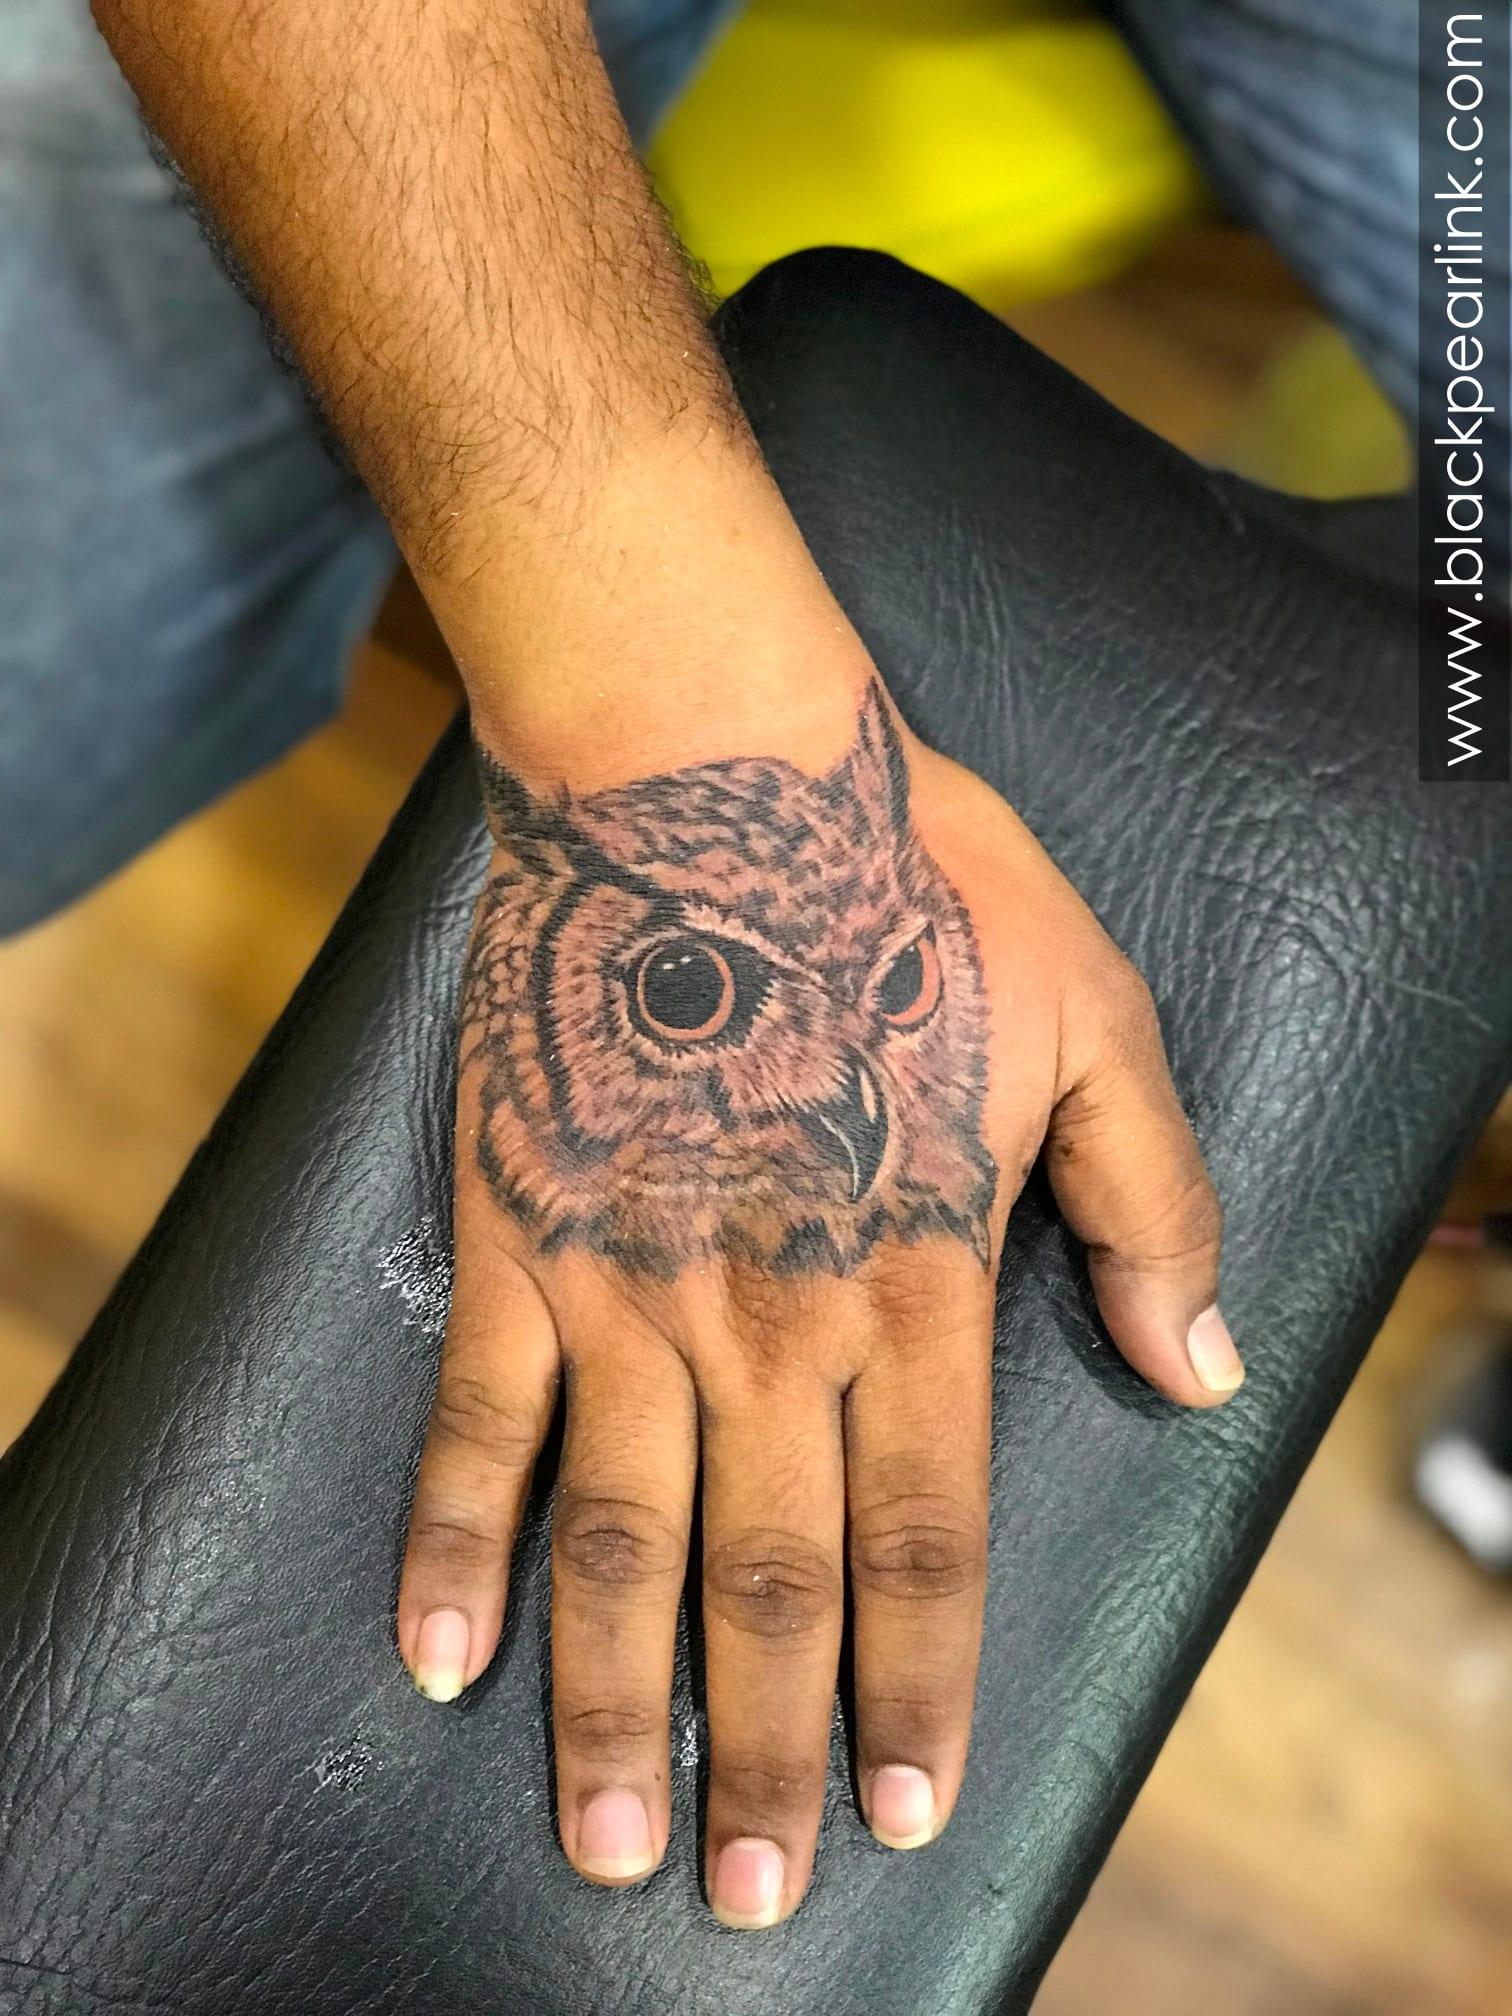 Owl Tattoo on Dorsum of Hand